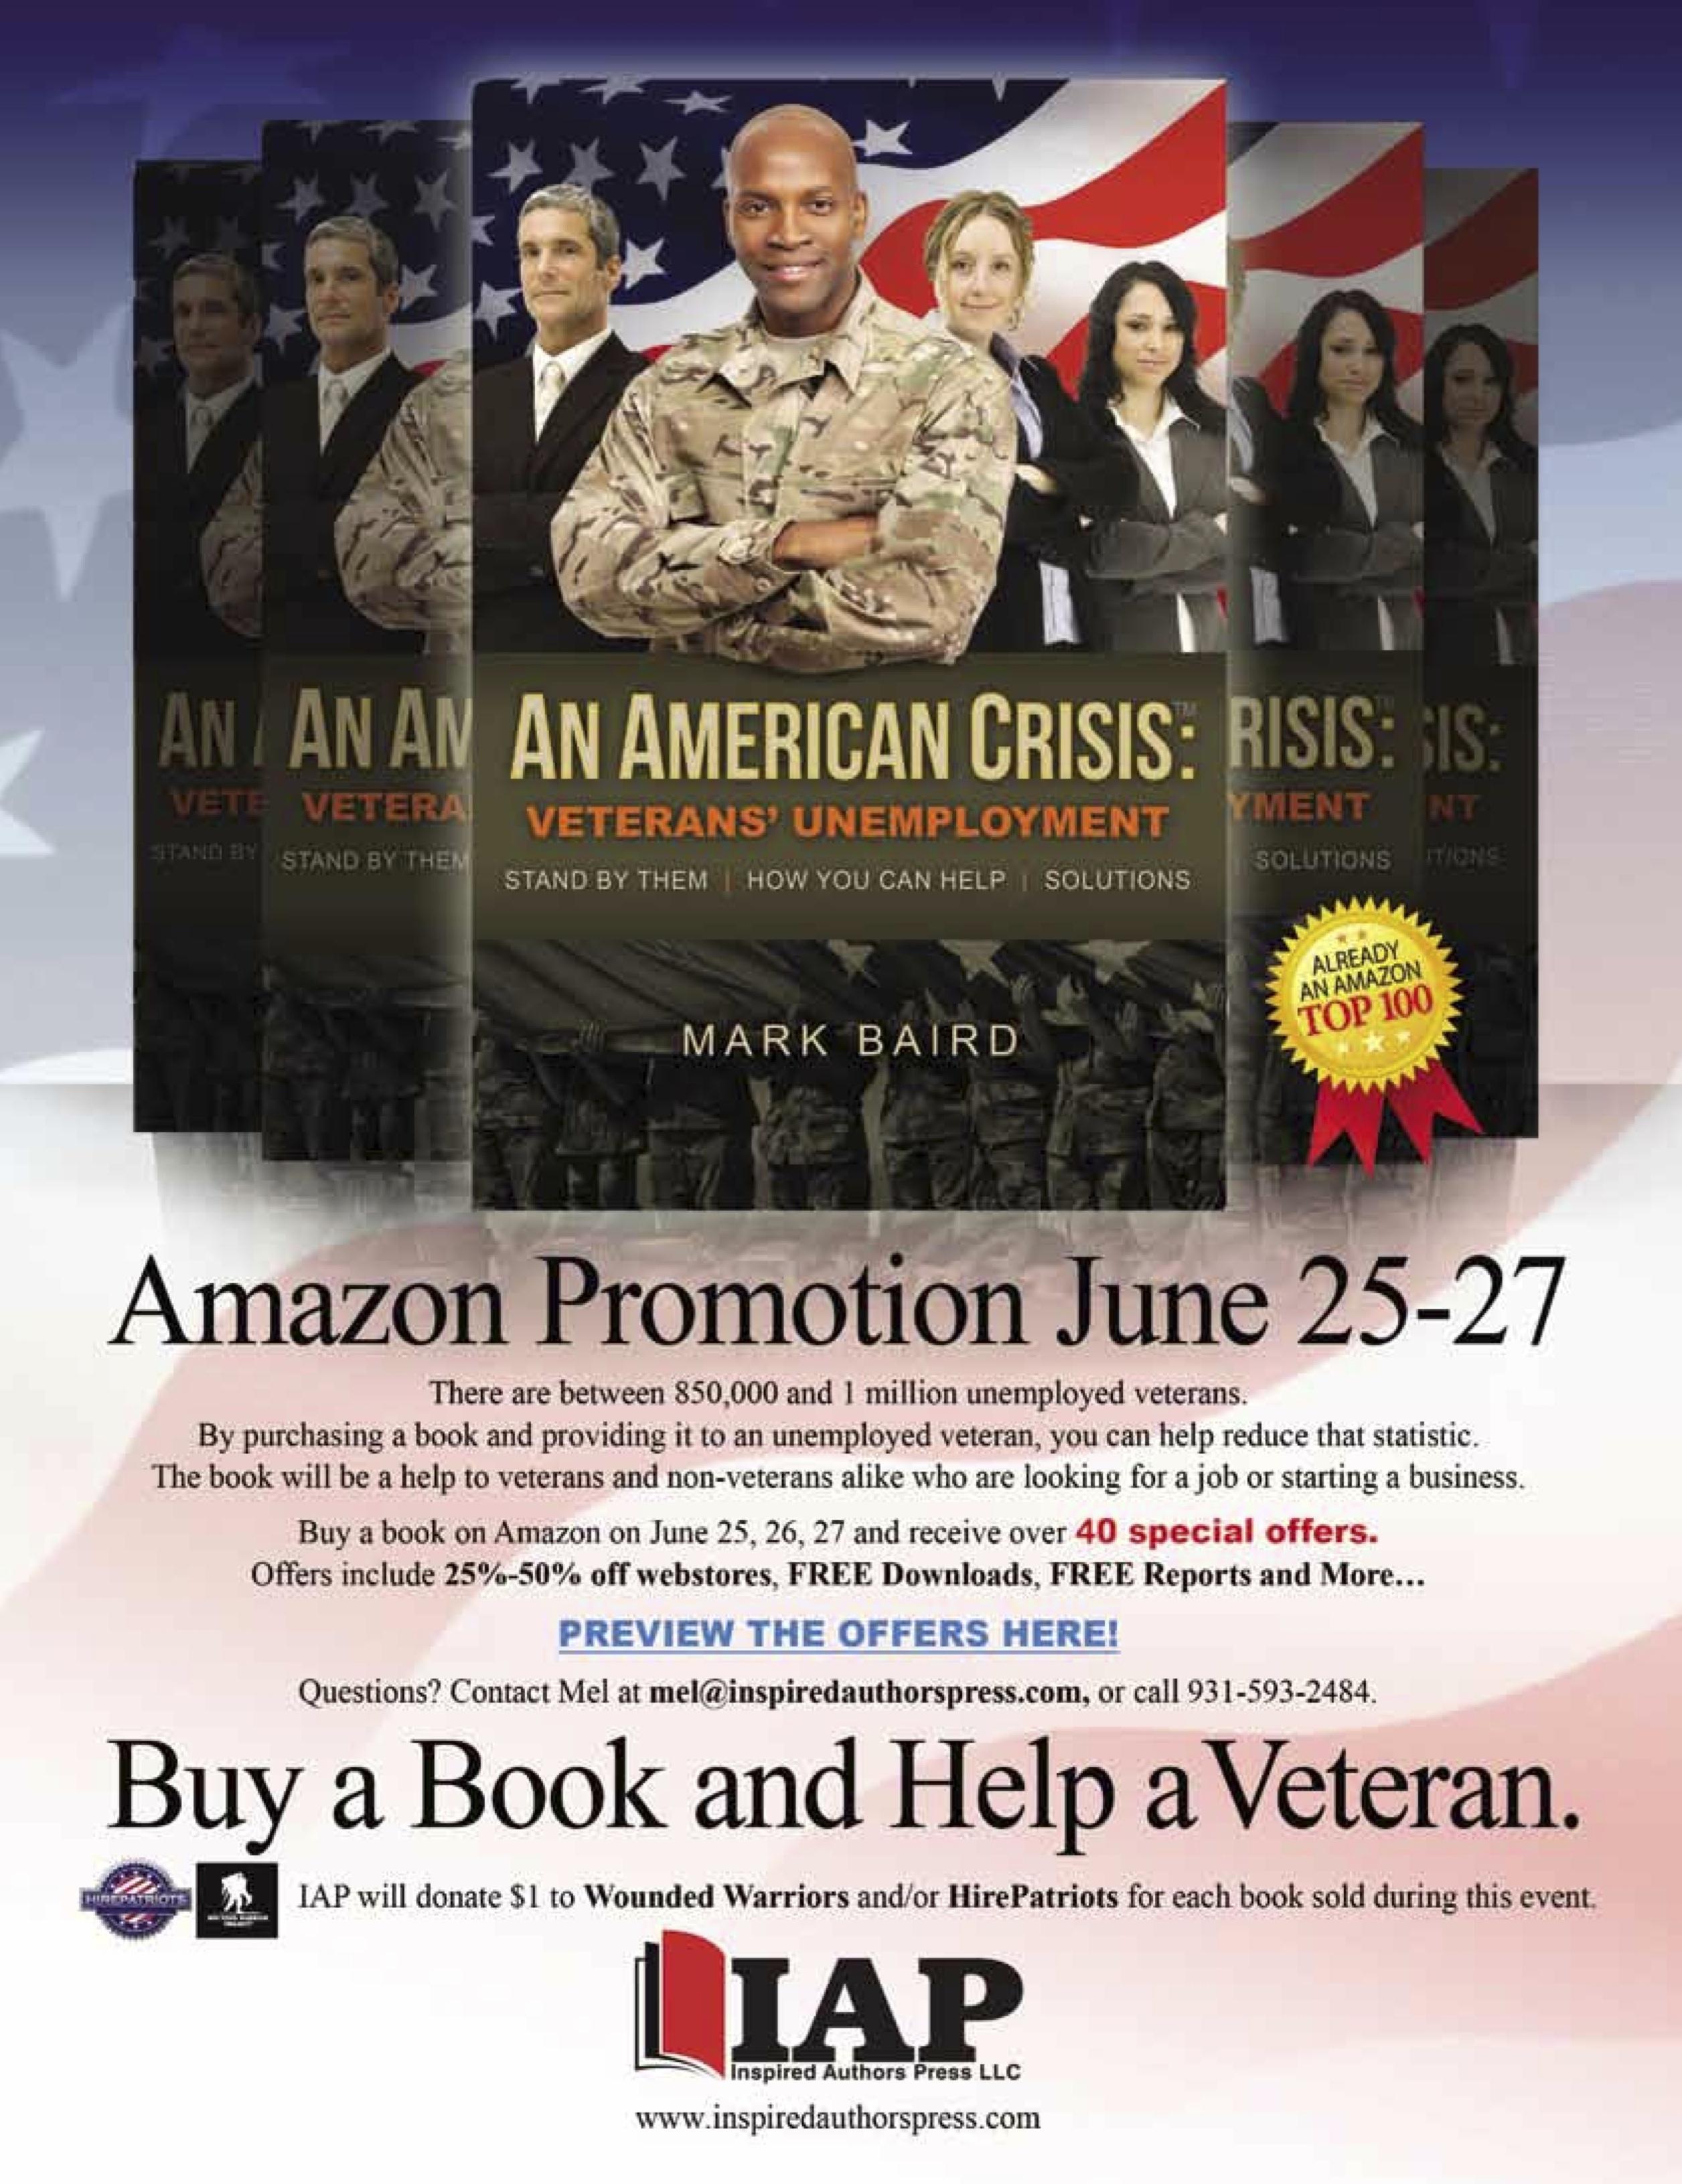 An American Crisis on Amazon